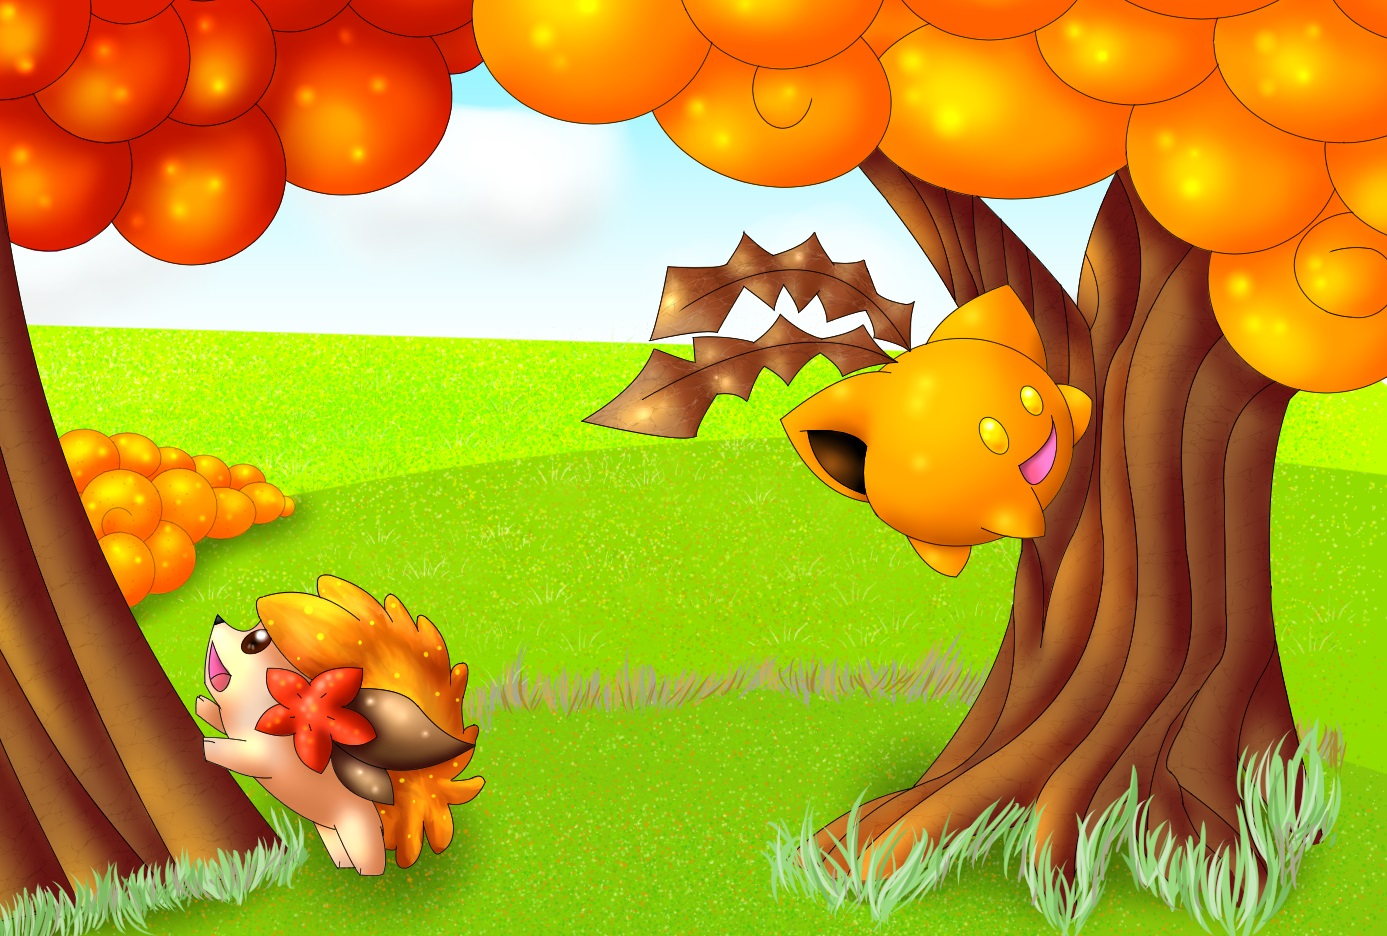 Pokémon-Zeichnung: Happy Autumn Pokis